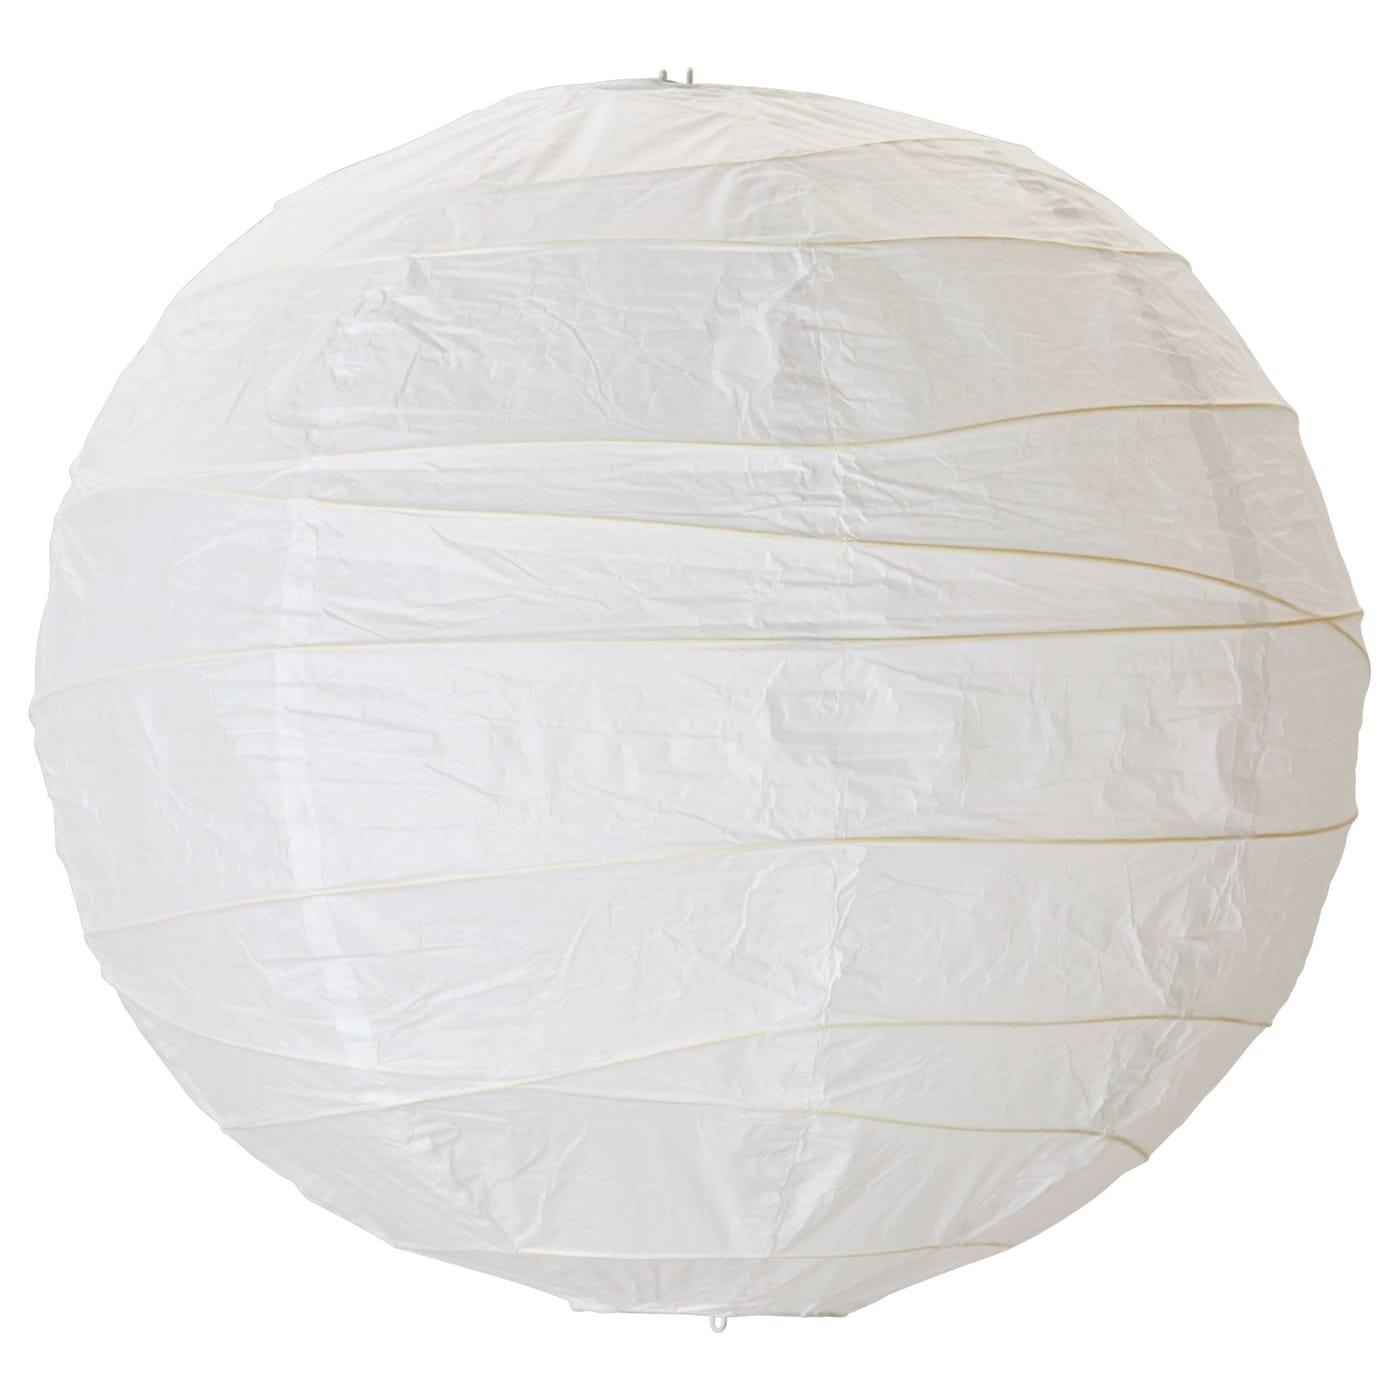 Regolit Pendant Lamp Shade White Ikea